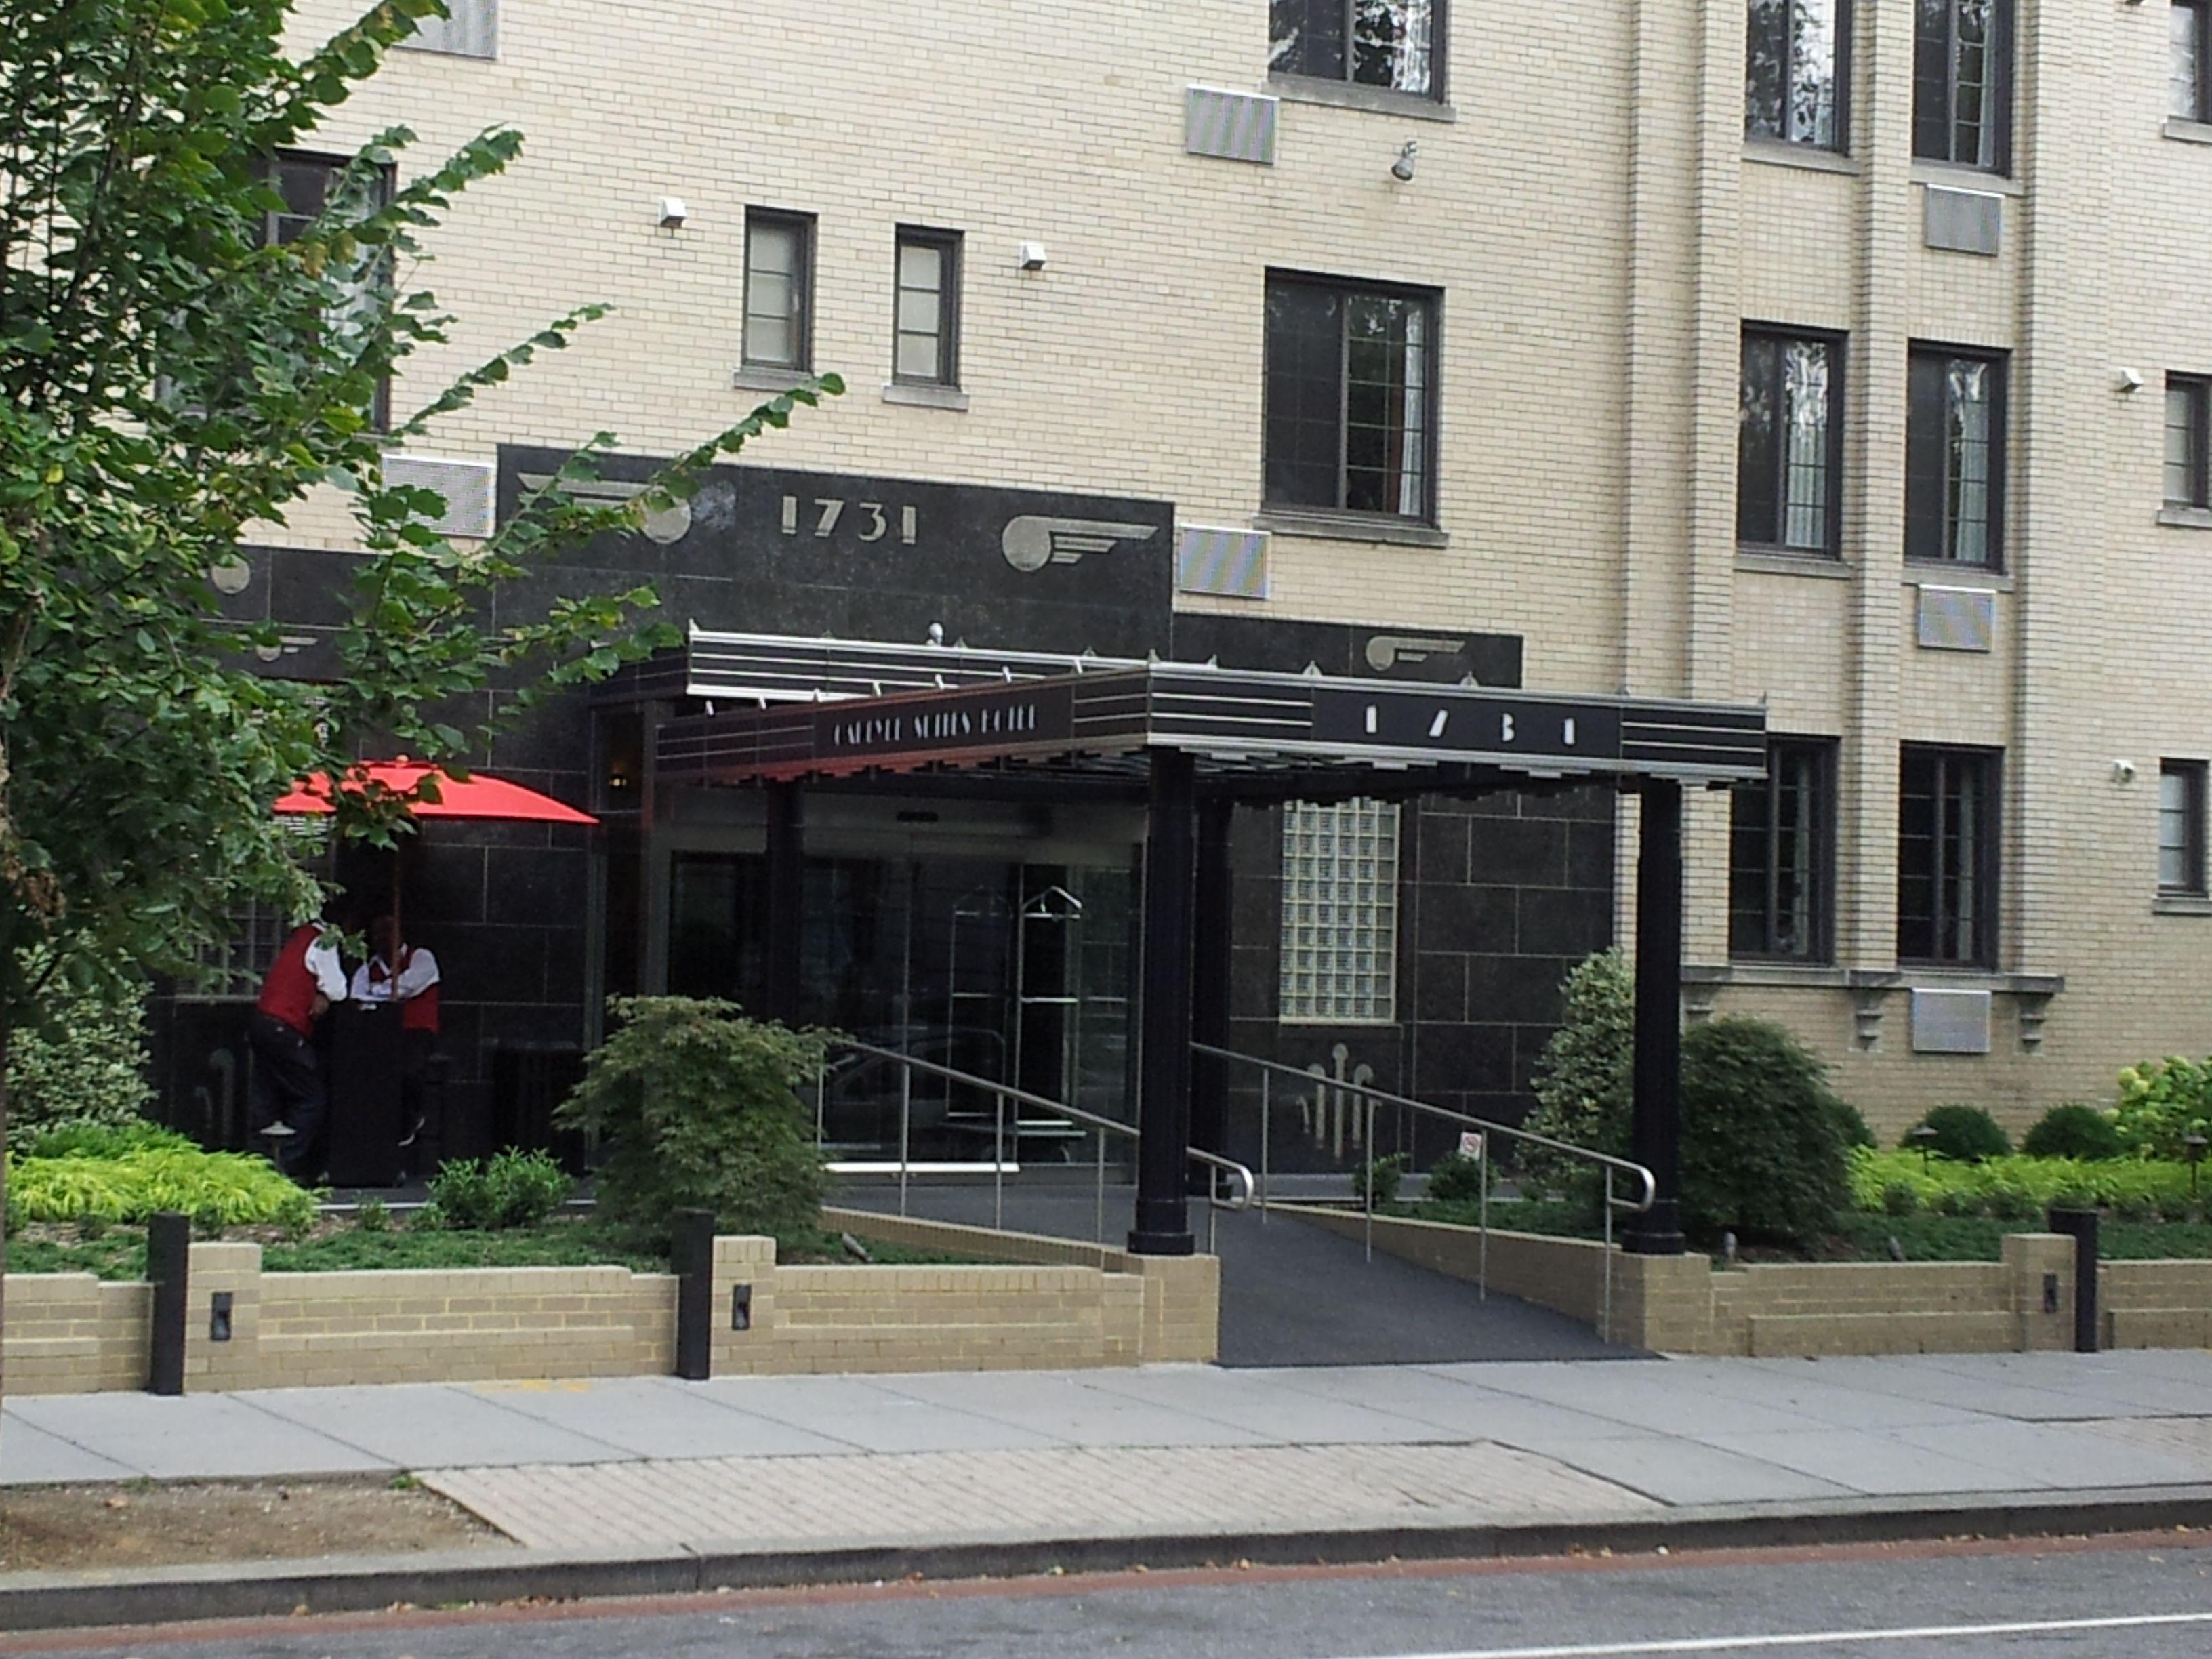 Carlyle Suites Hotel  New Hampshire Ave Nw Washington Dc